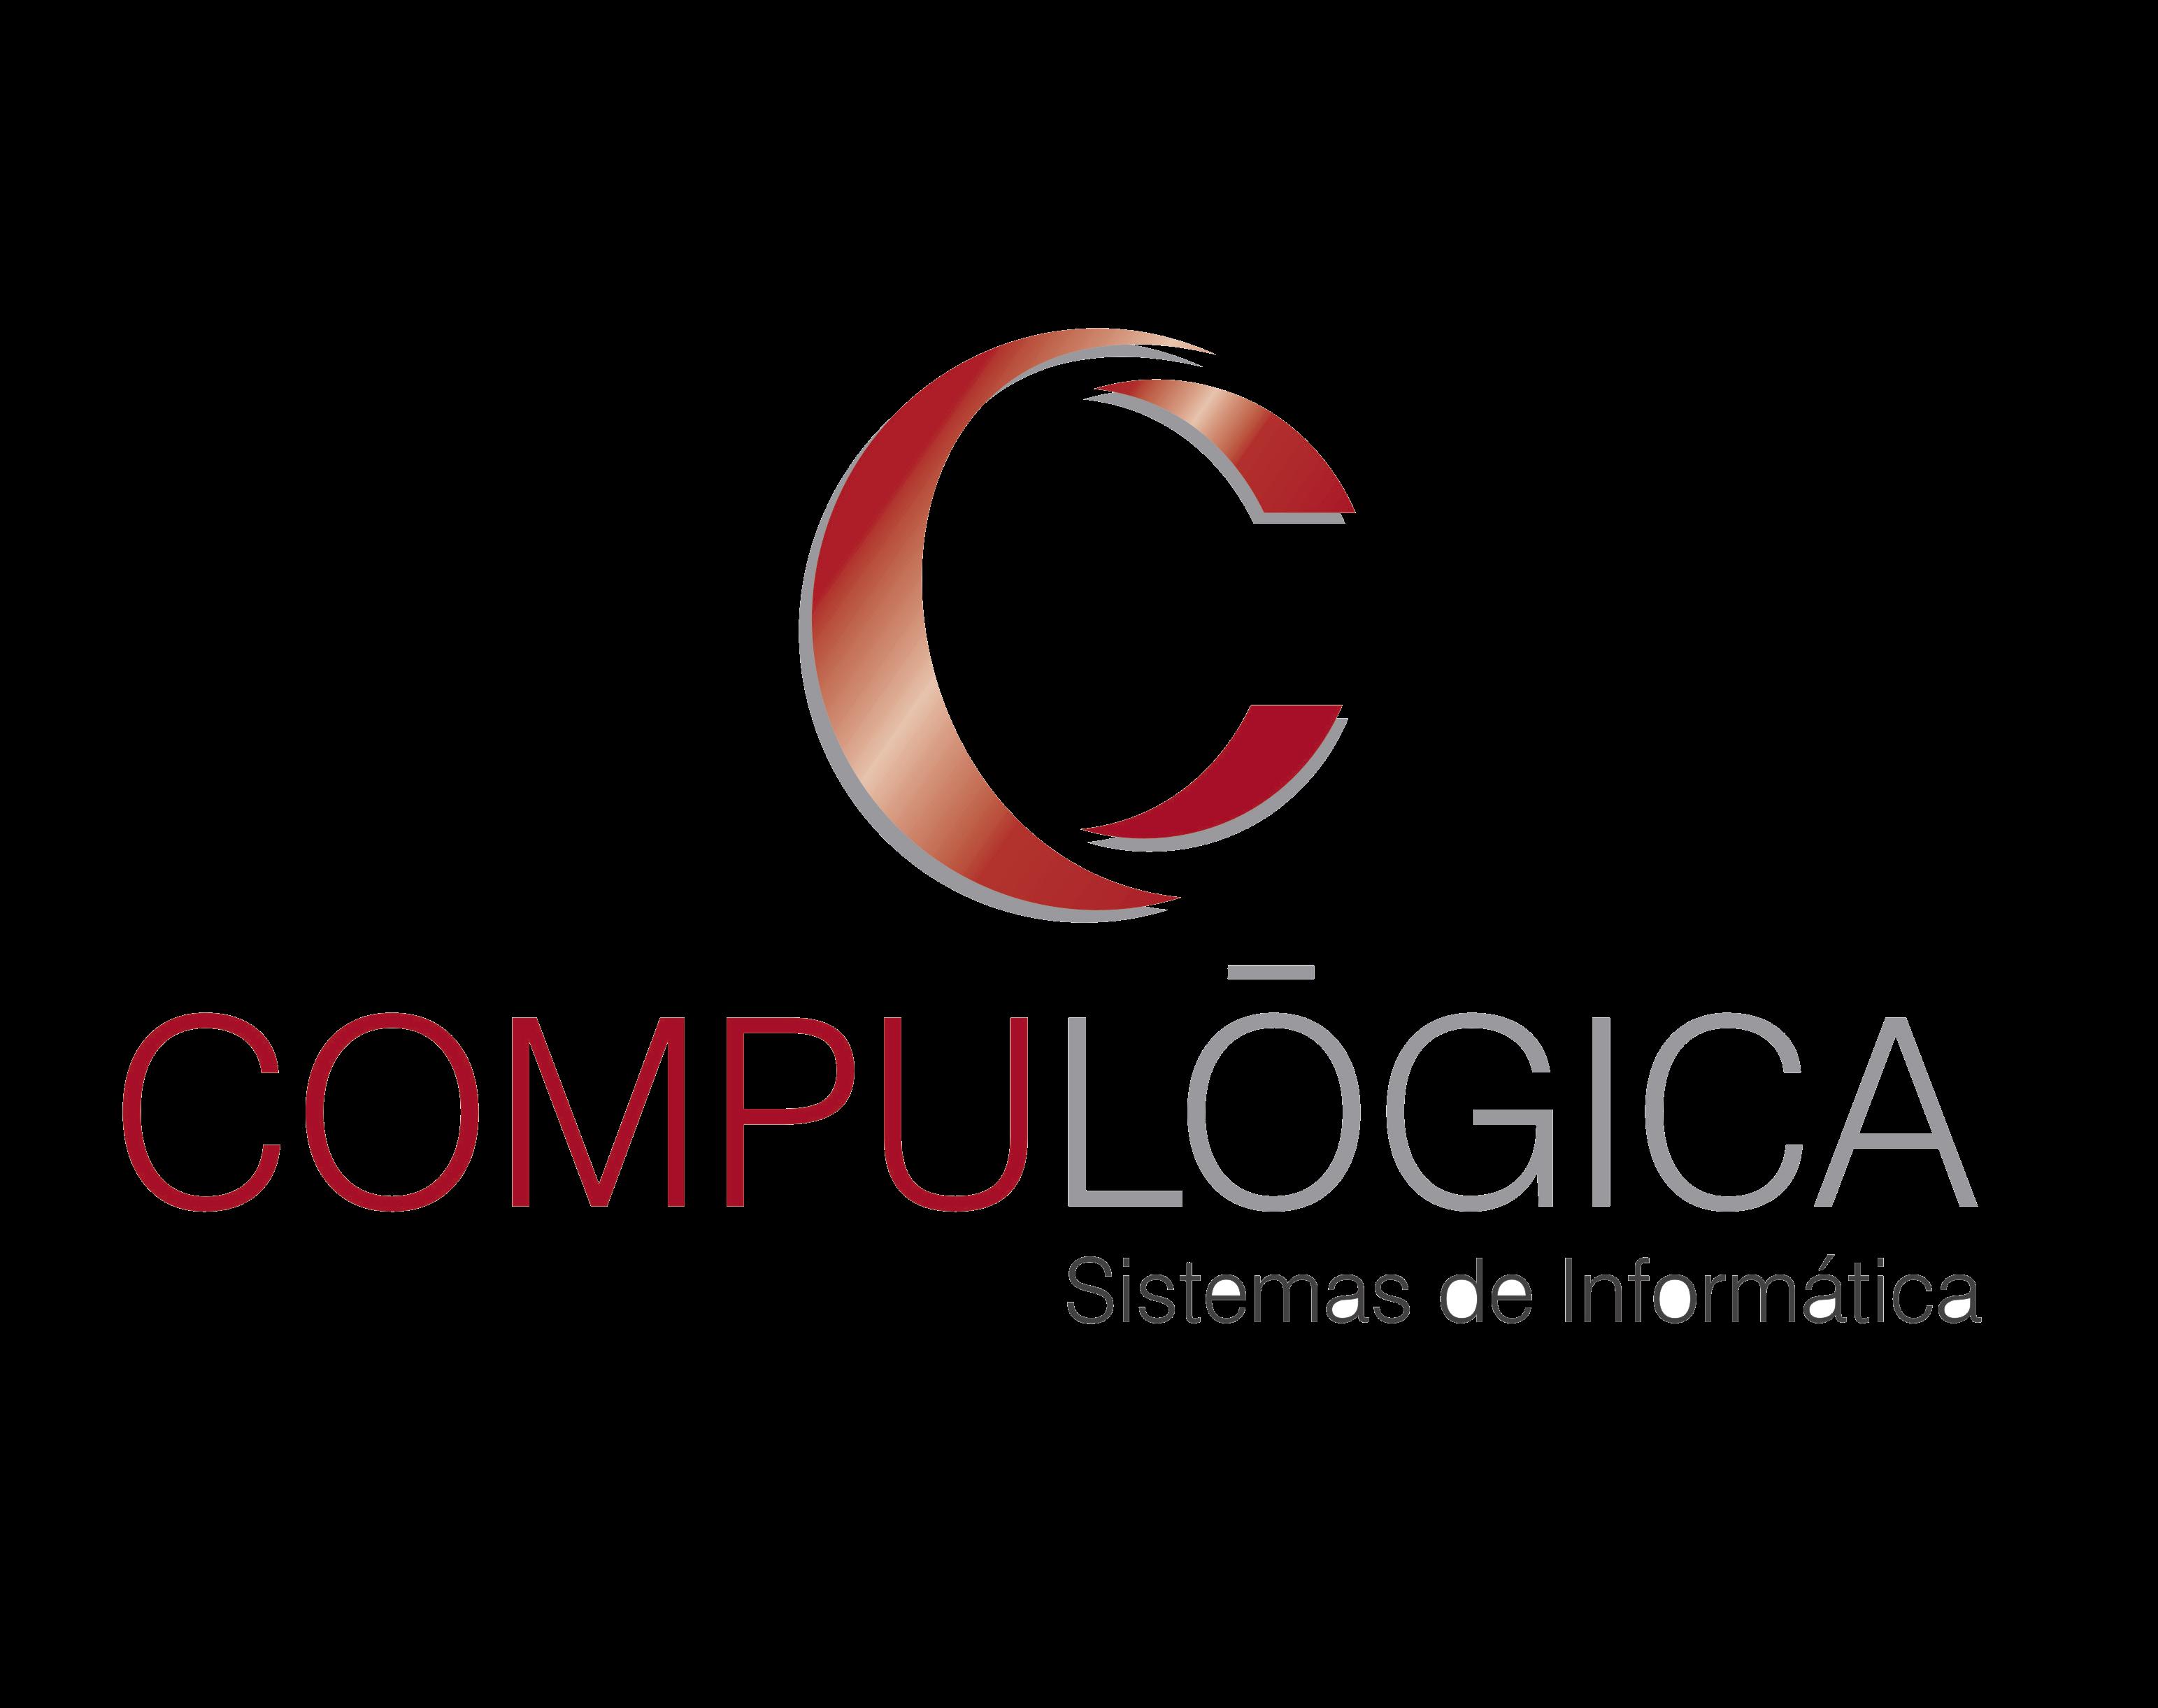 Compulógica Sistemas de Informática